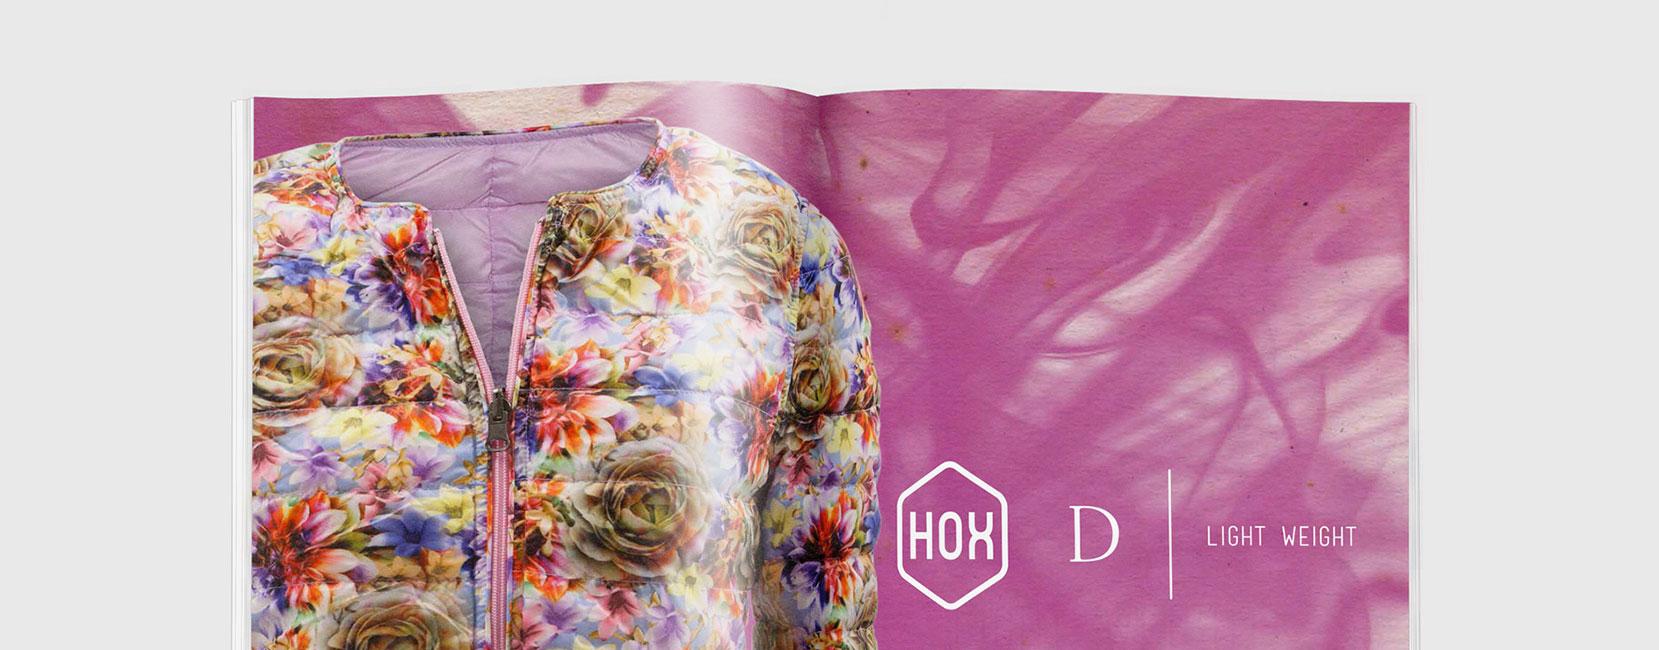 Hox SS14